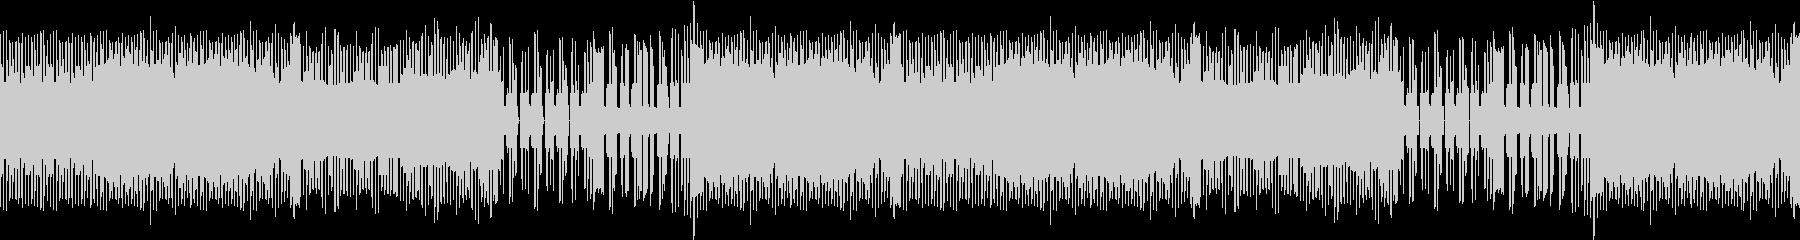 EDMでファミコン風なゲームBGMの未再生の波形